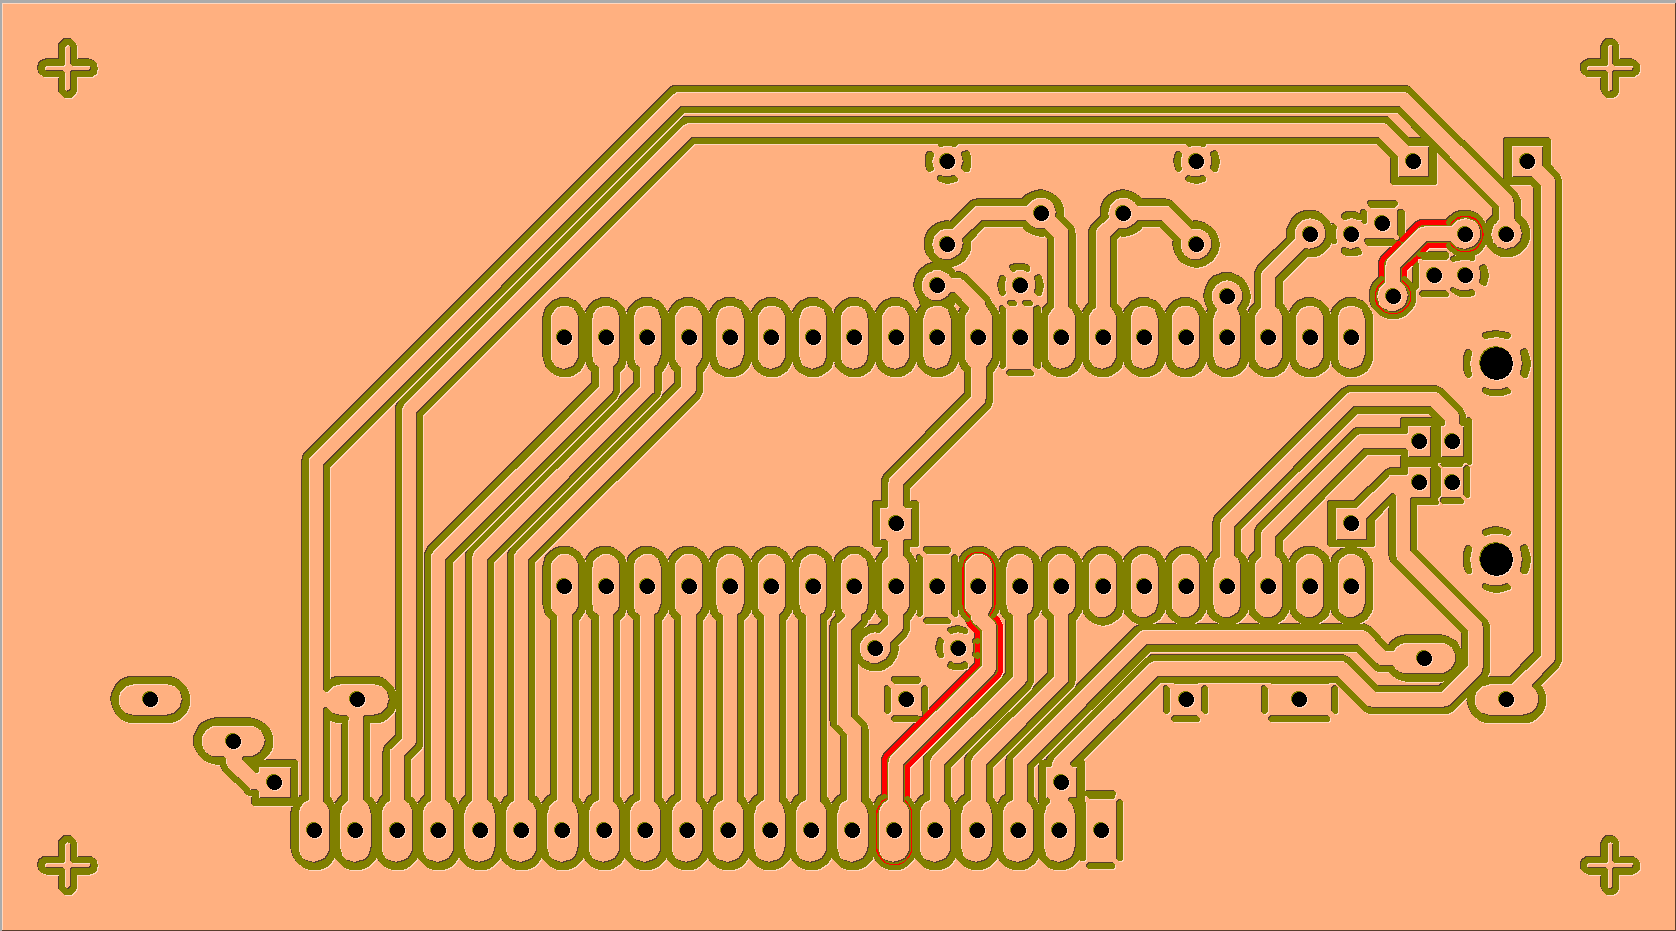 Exporter un Circuit Imprimé depuis EAGLE vers GALAAD/PERCIVAL